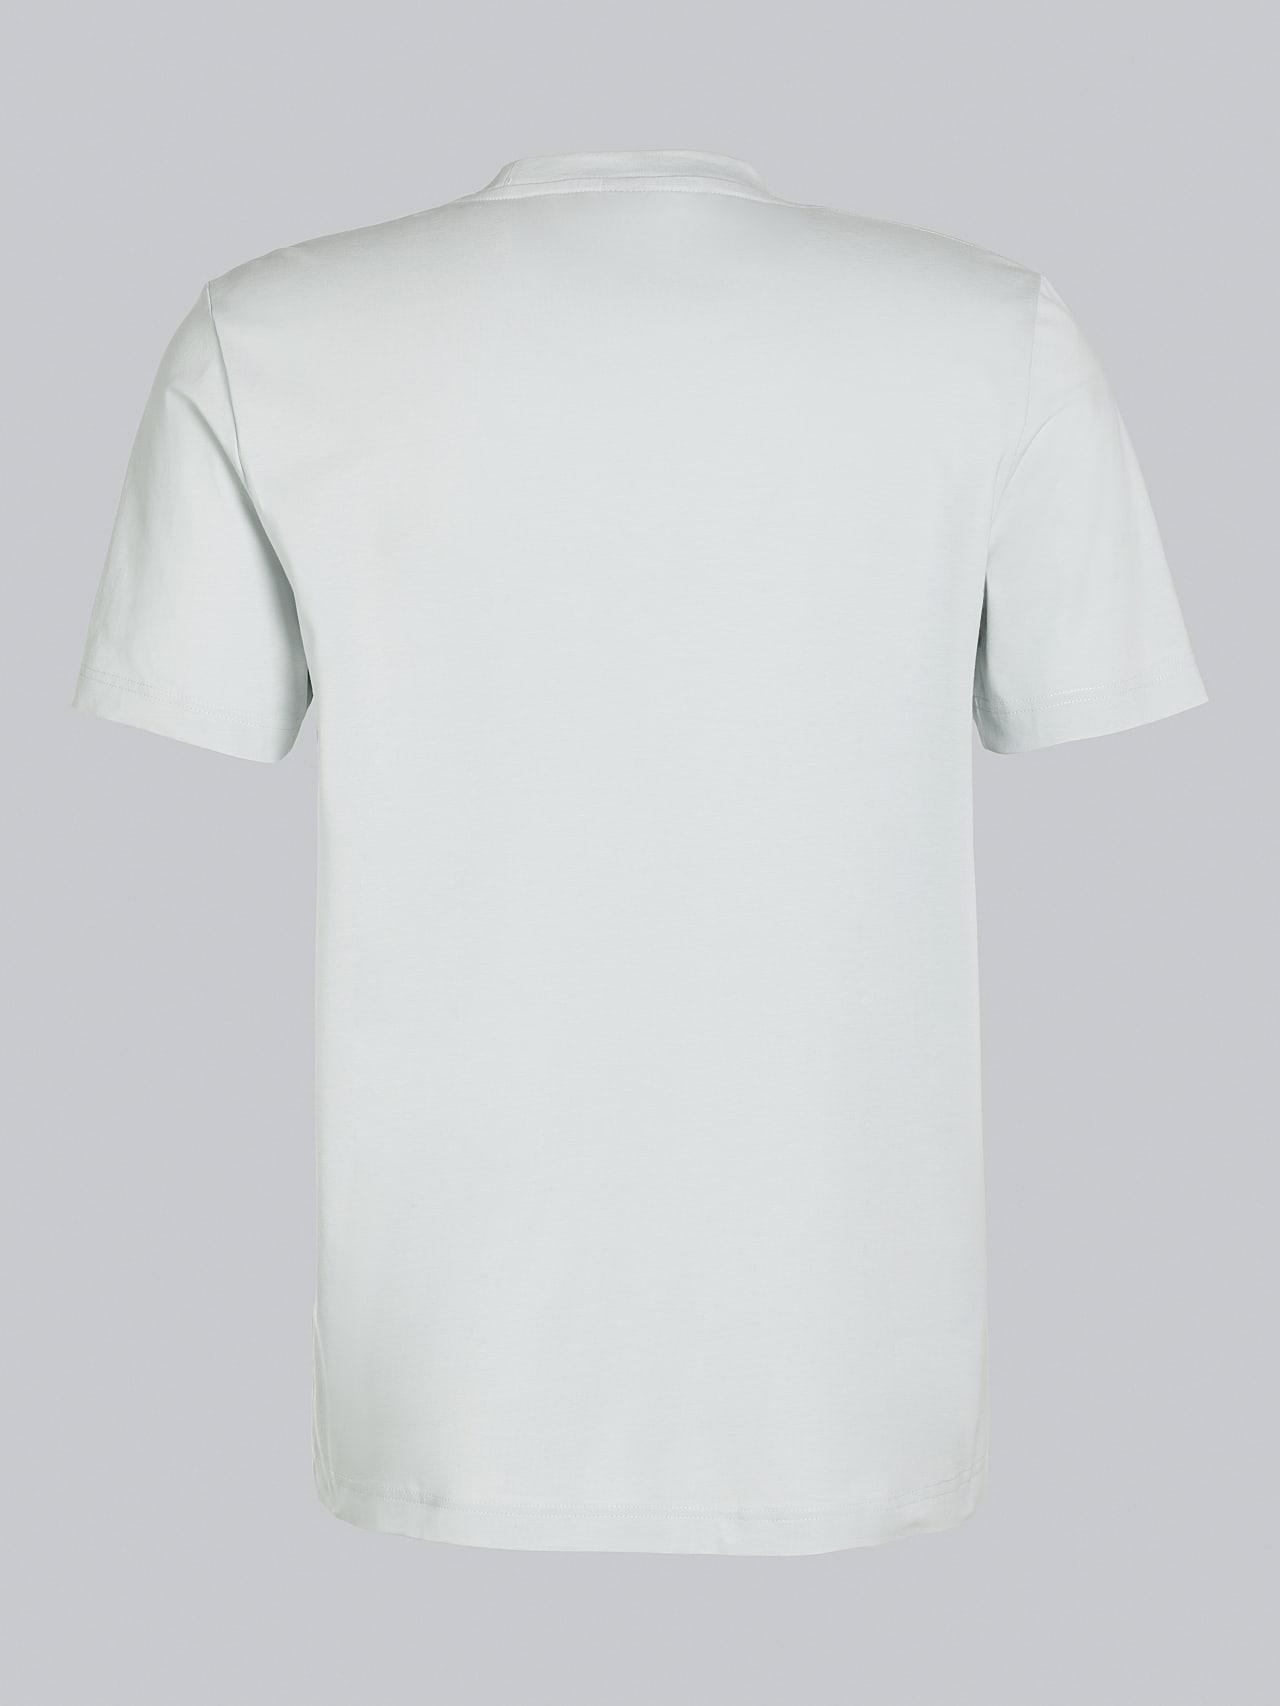 JABIS V1.Y5.02 Logo Print T-Shirt Pale Blue  Left Alpha Tauri